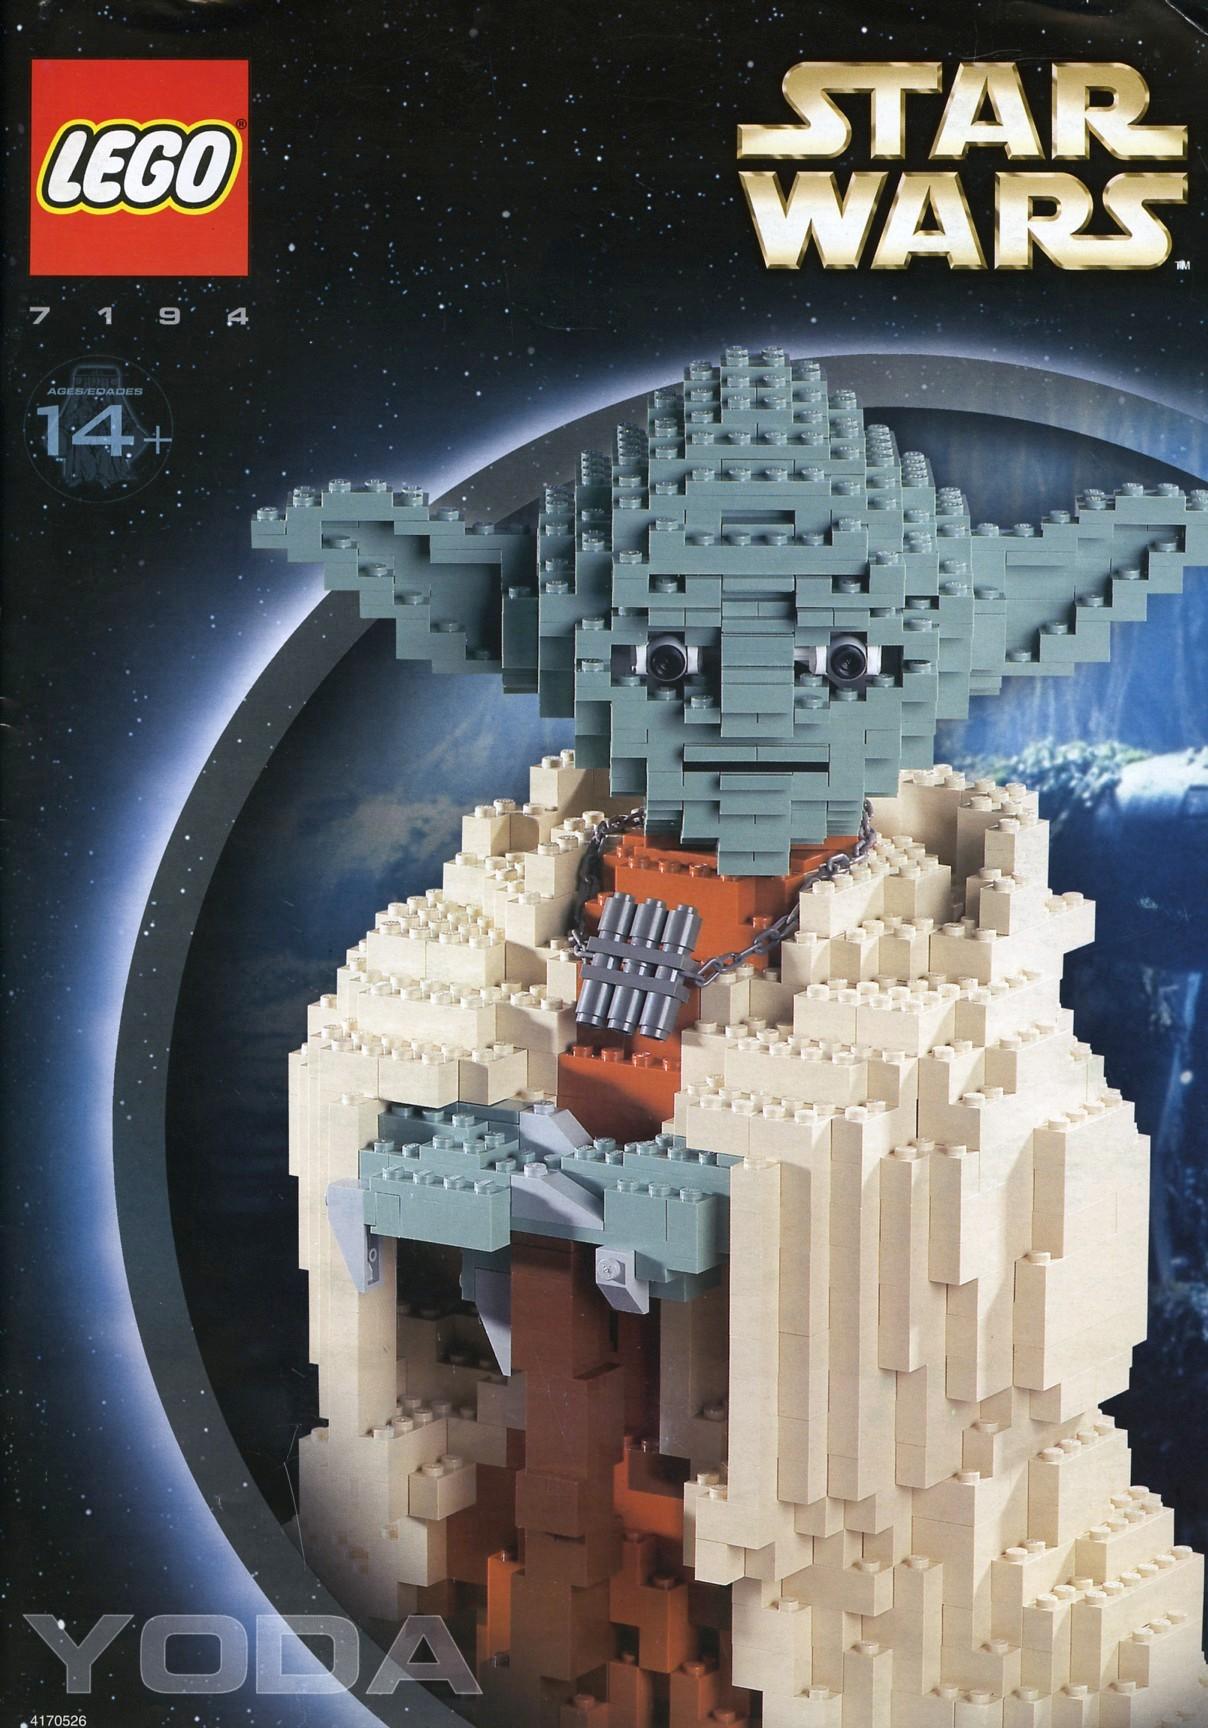 lego-star-wars-yoda-7194-2002-komplett zusammengebaut.com